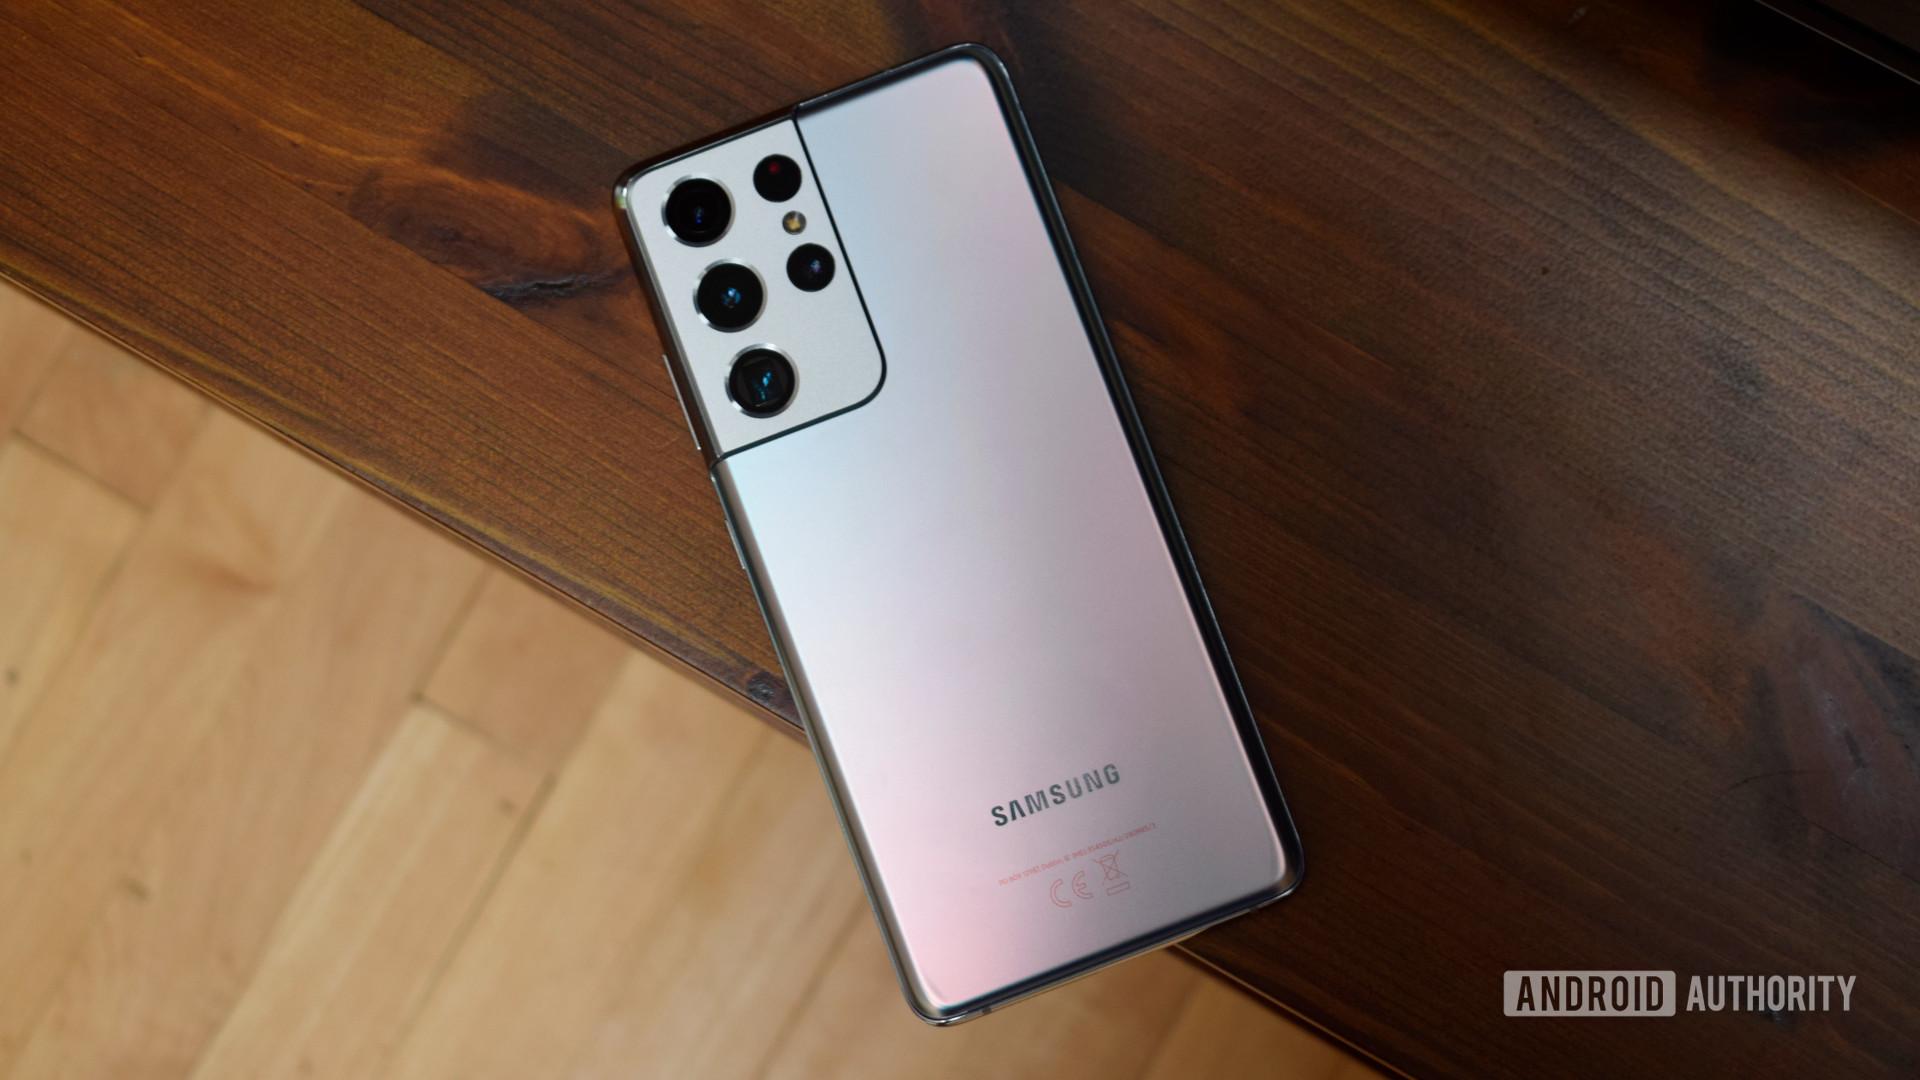 Samsung Galaxy S21 Ultra face down on desk